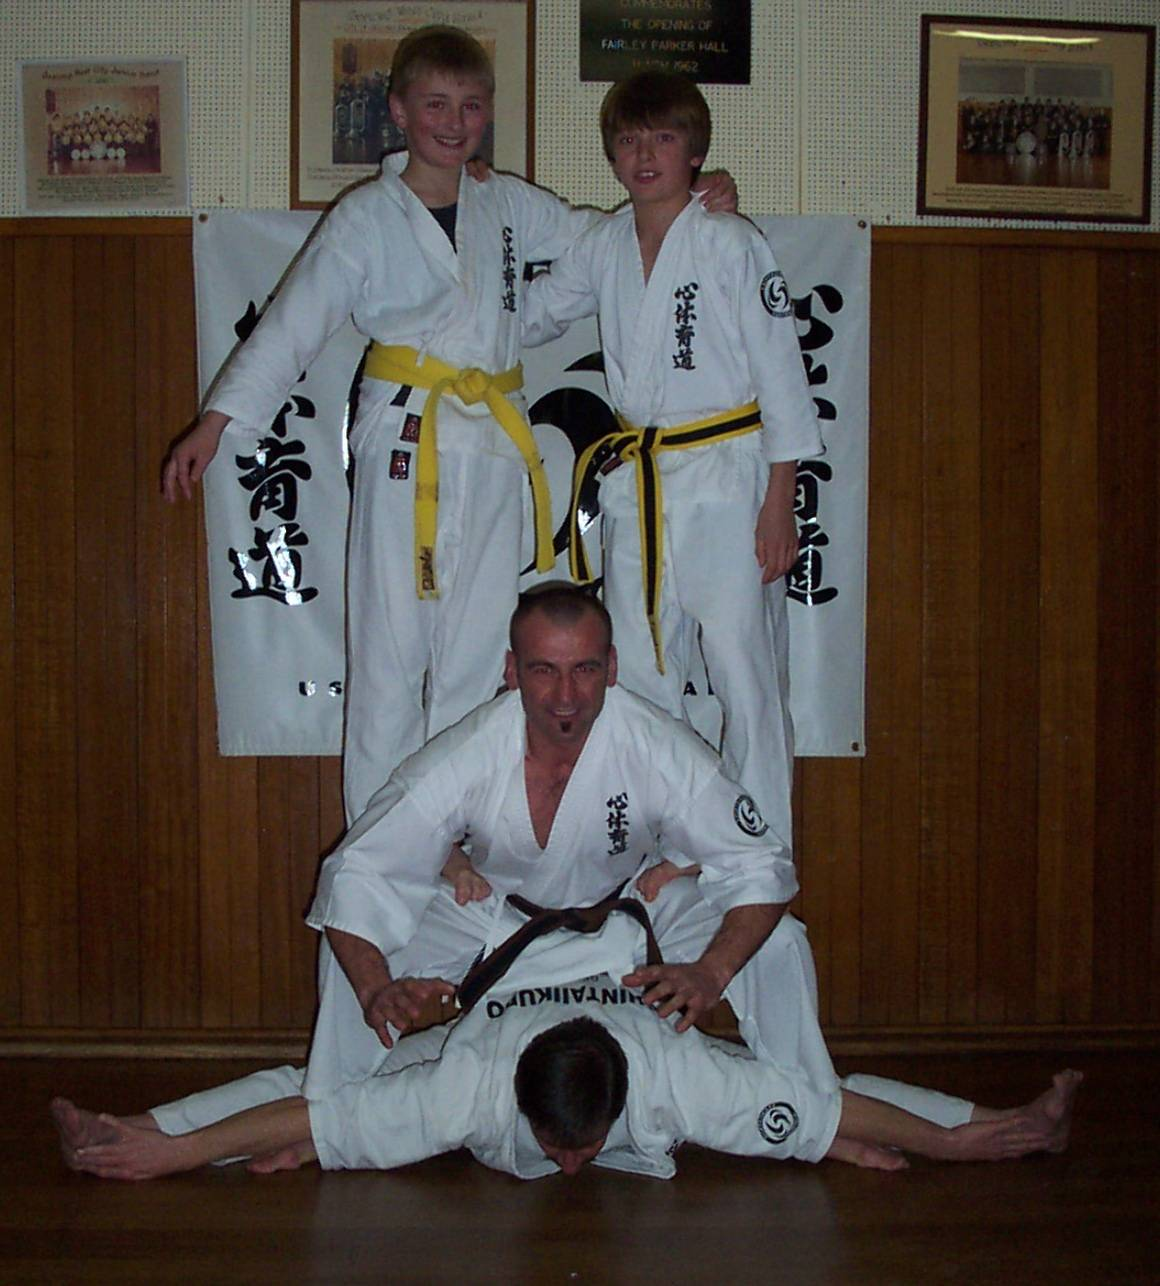 Sensei Craig demonstrates flexibility & strength